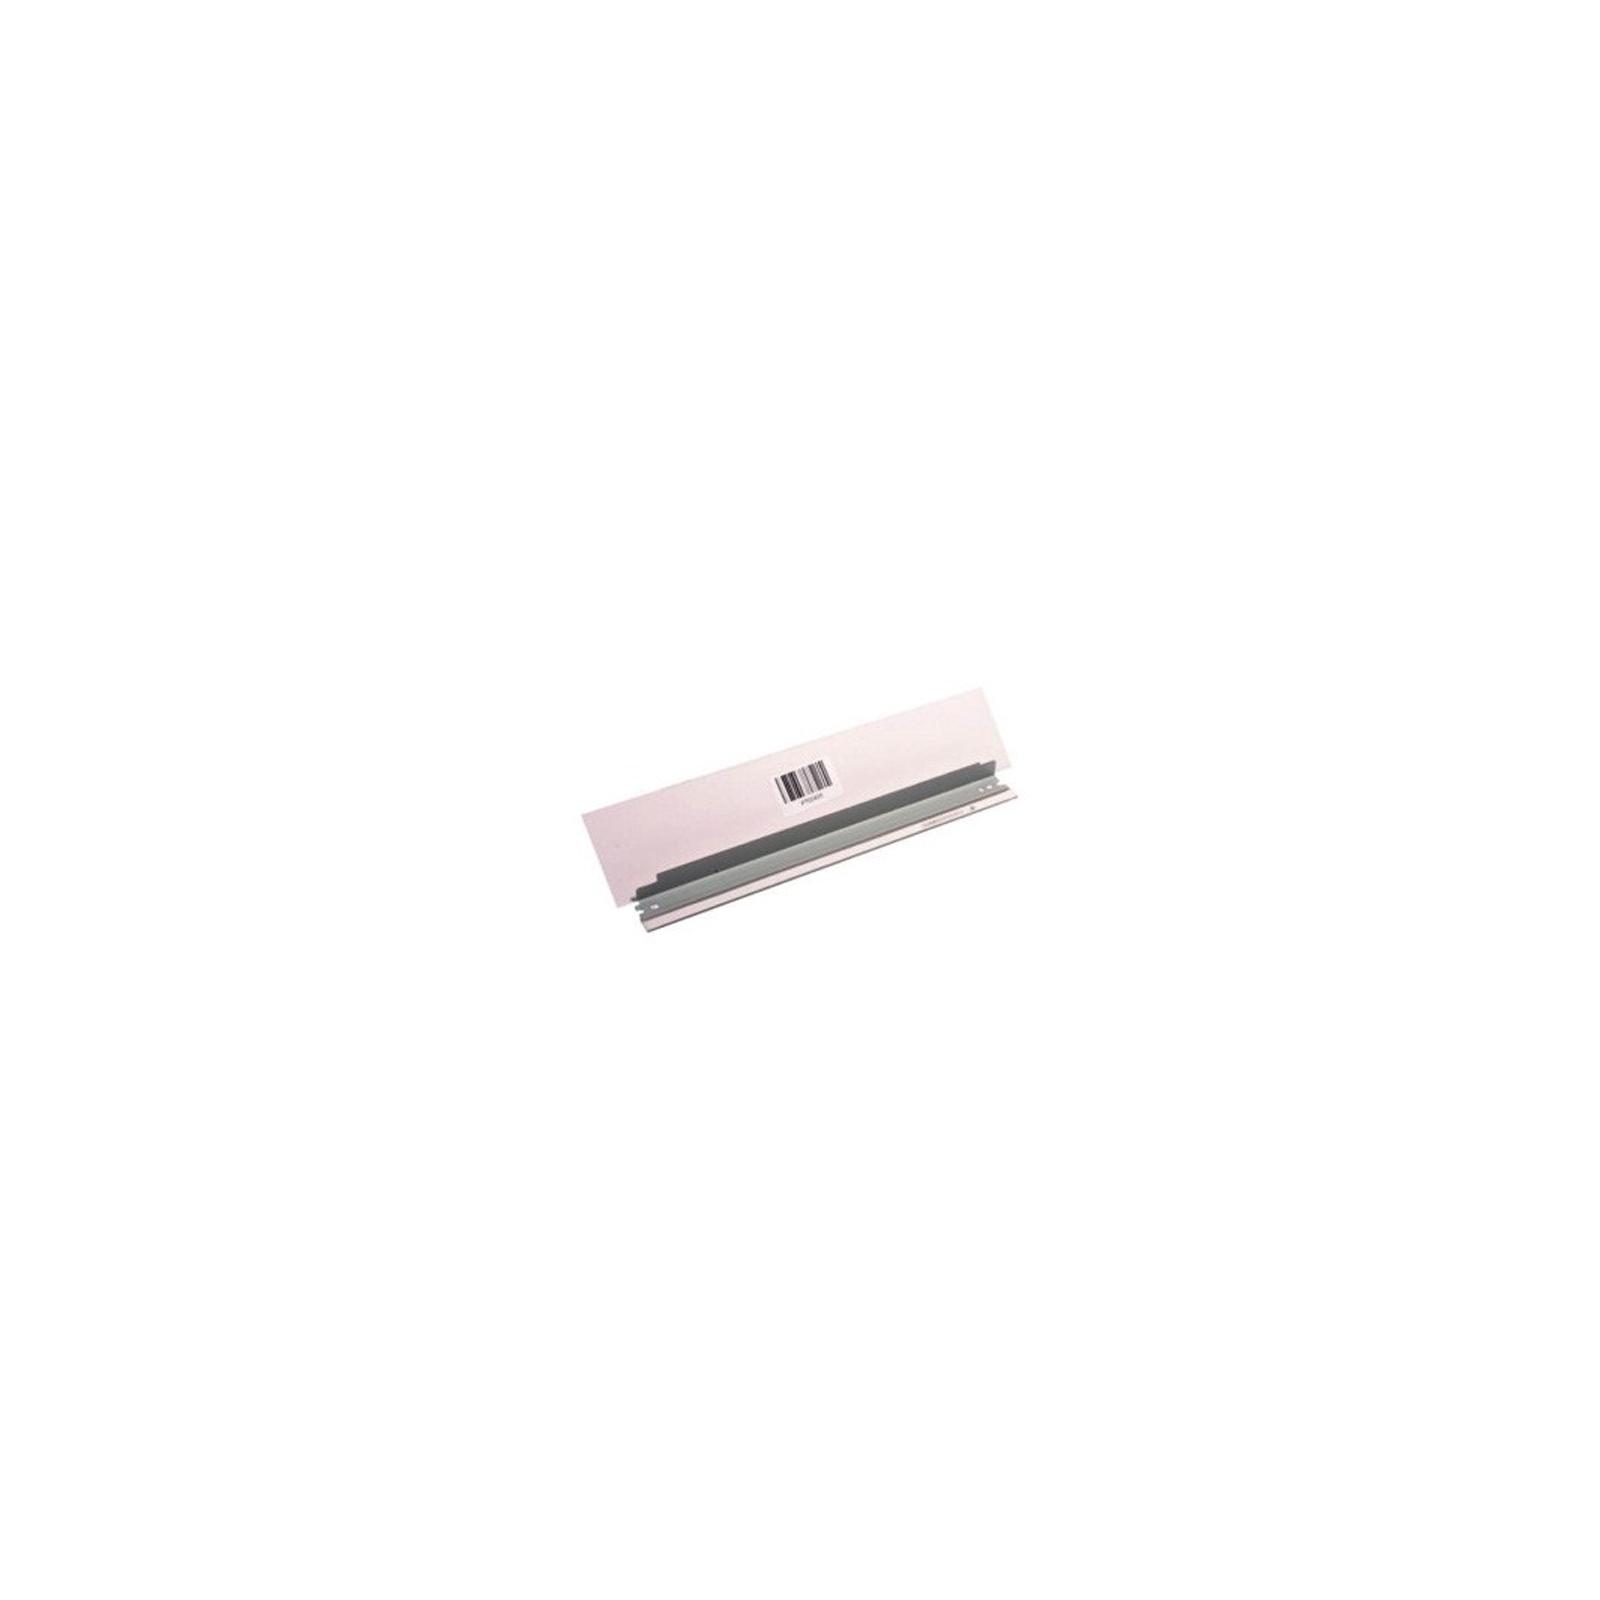 Чистящее лезвие HP LJ P1005/1006/1505 Static Control (HP1505BLADE)